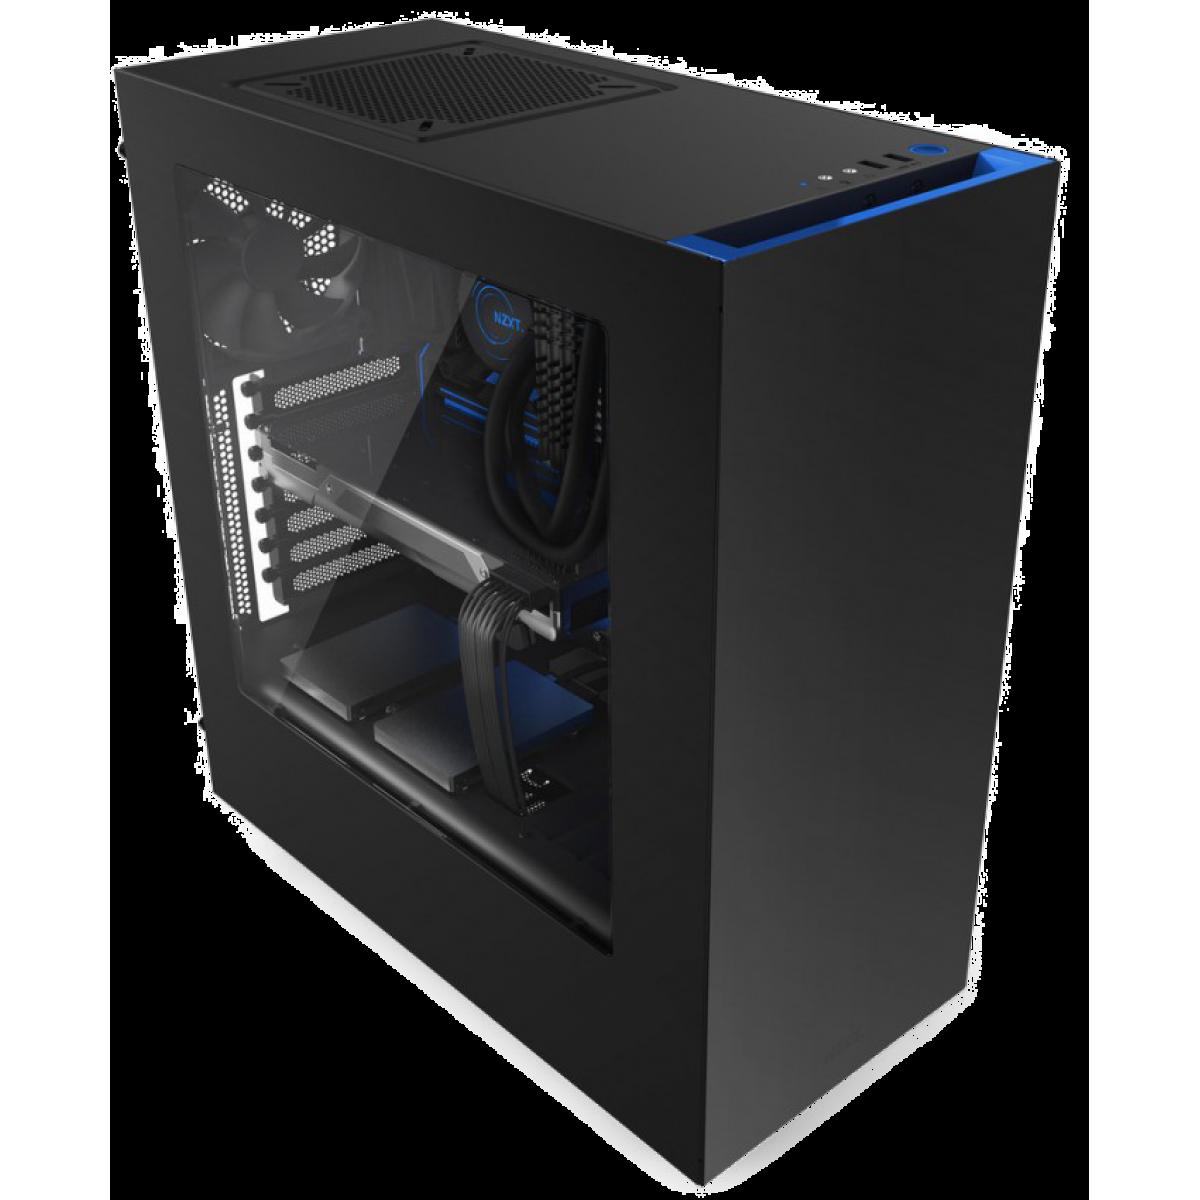 Gabinete Gamer NZXT S340, Mid Tower, Com 2 Fans, Vidro Temperado, Black-Blue, Sem Fonte, CA-S340MB-GB